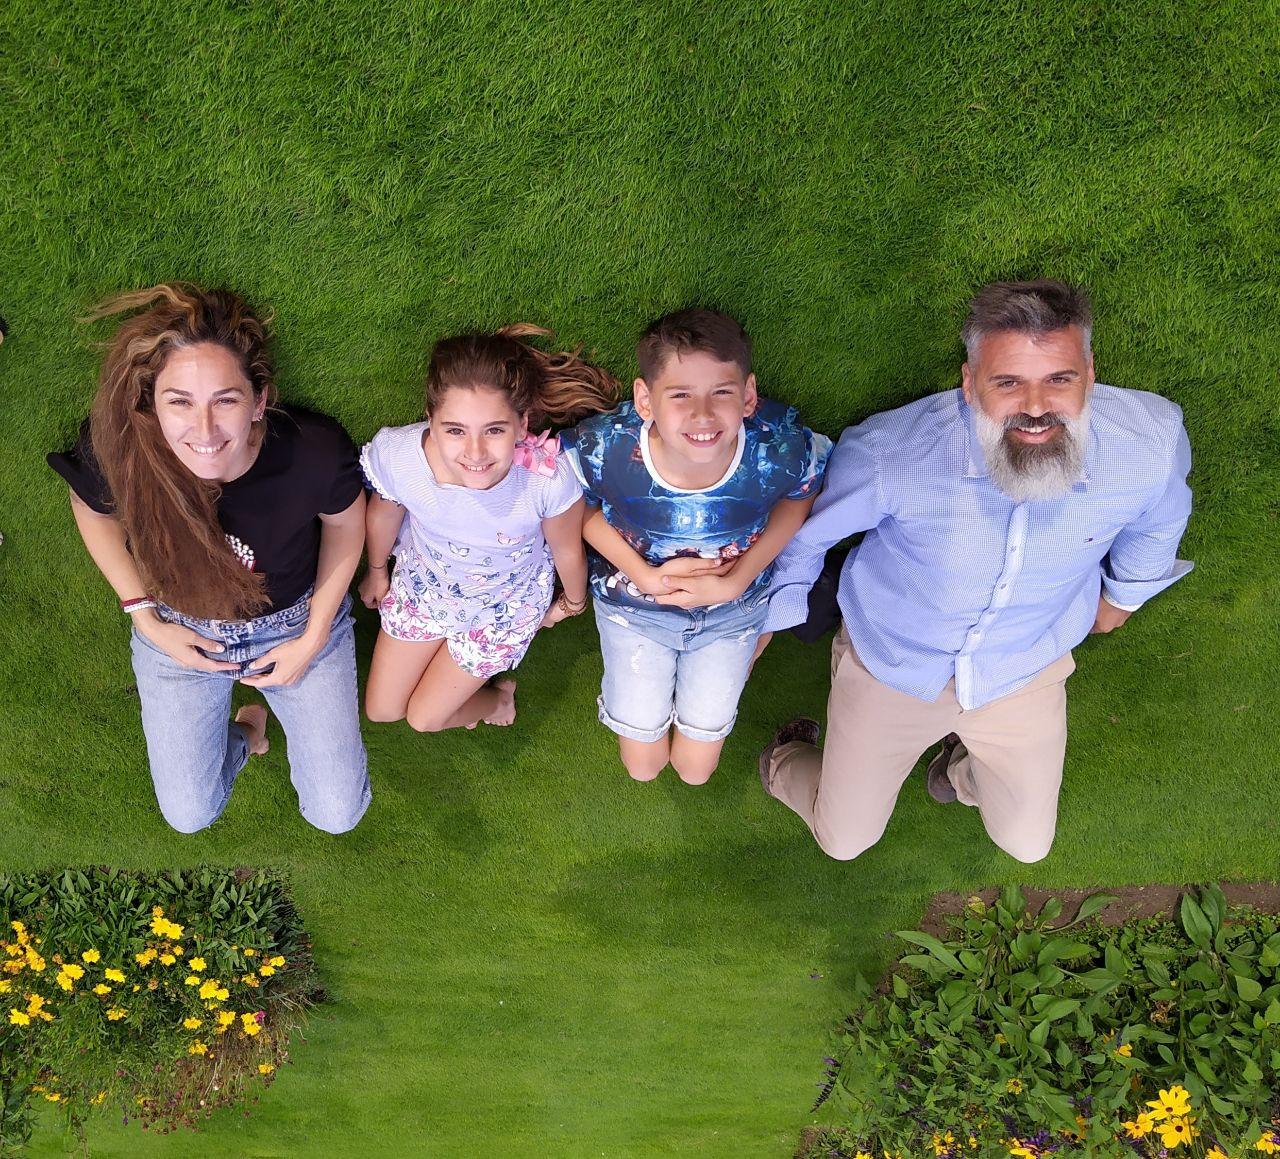 De viajar en autocaravana por Europa a vivir viajando en familia